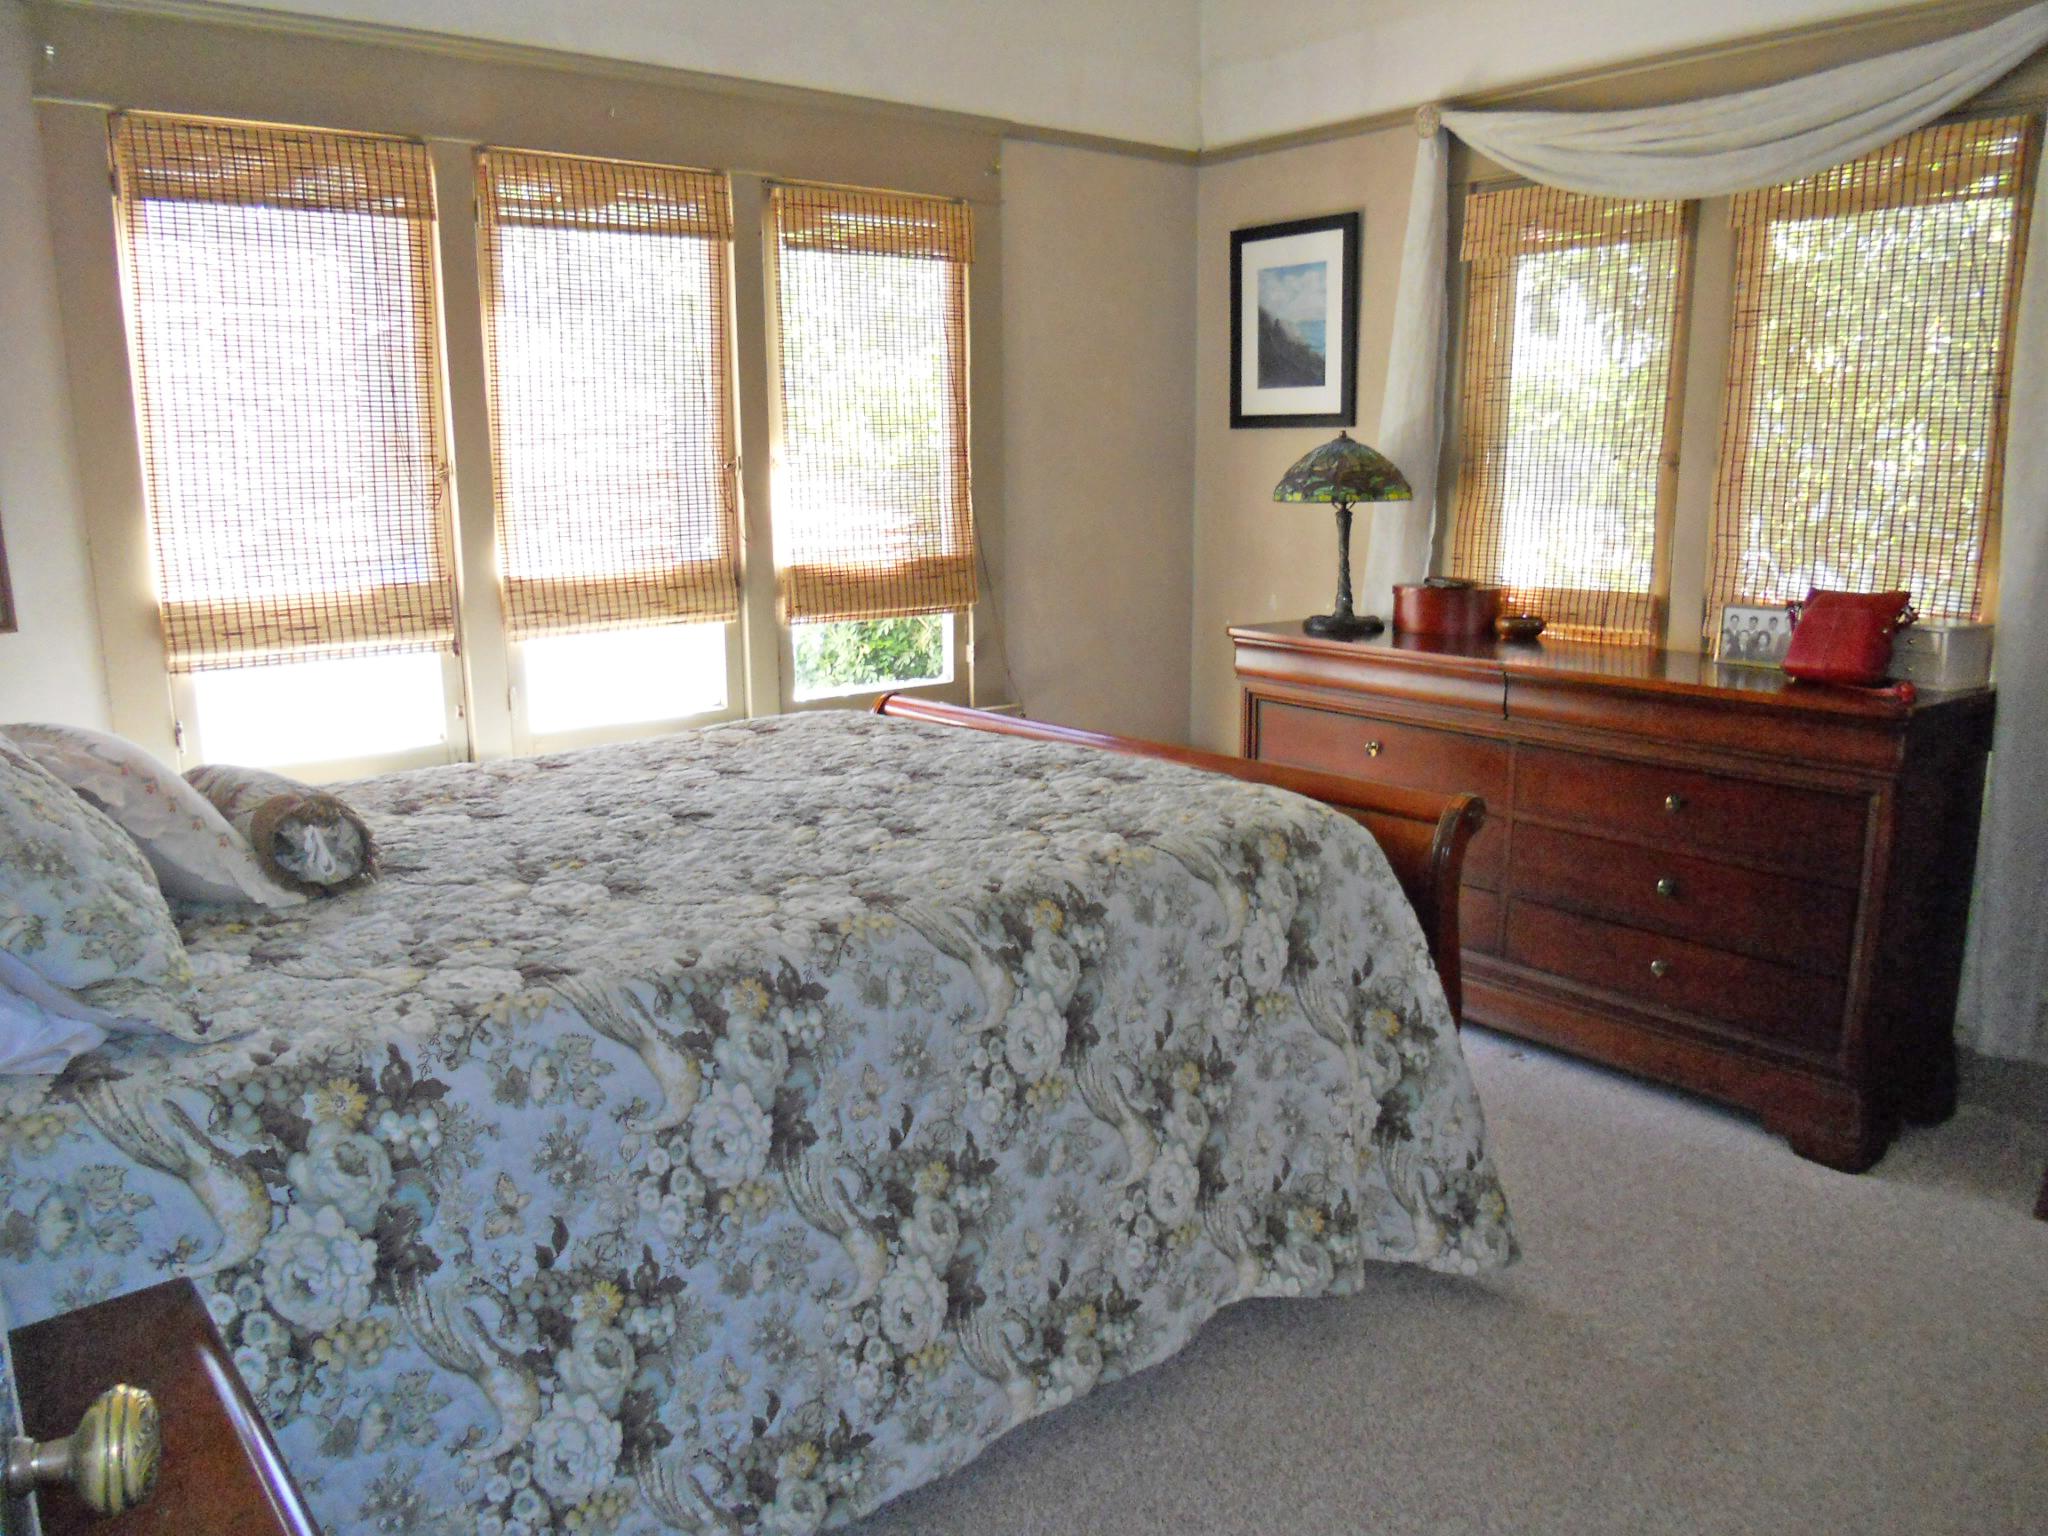 Alternate view of front bedroom.